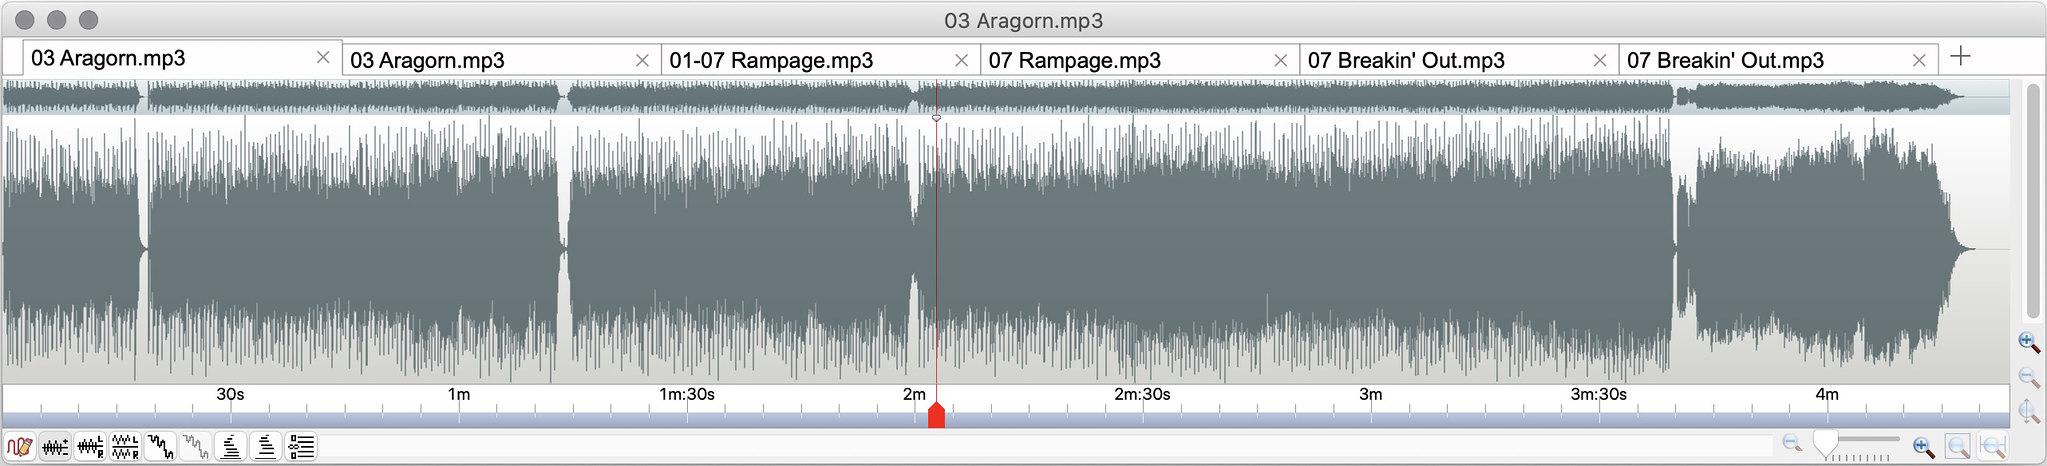 Aragorn 1982/1996 version